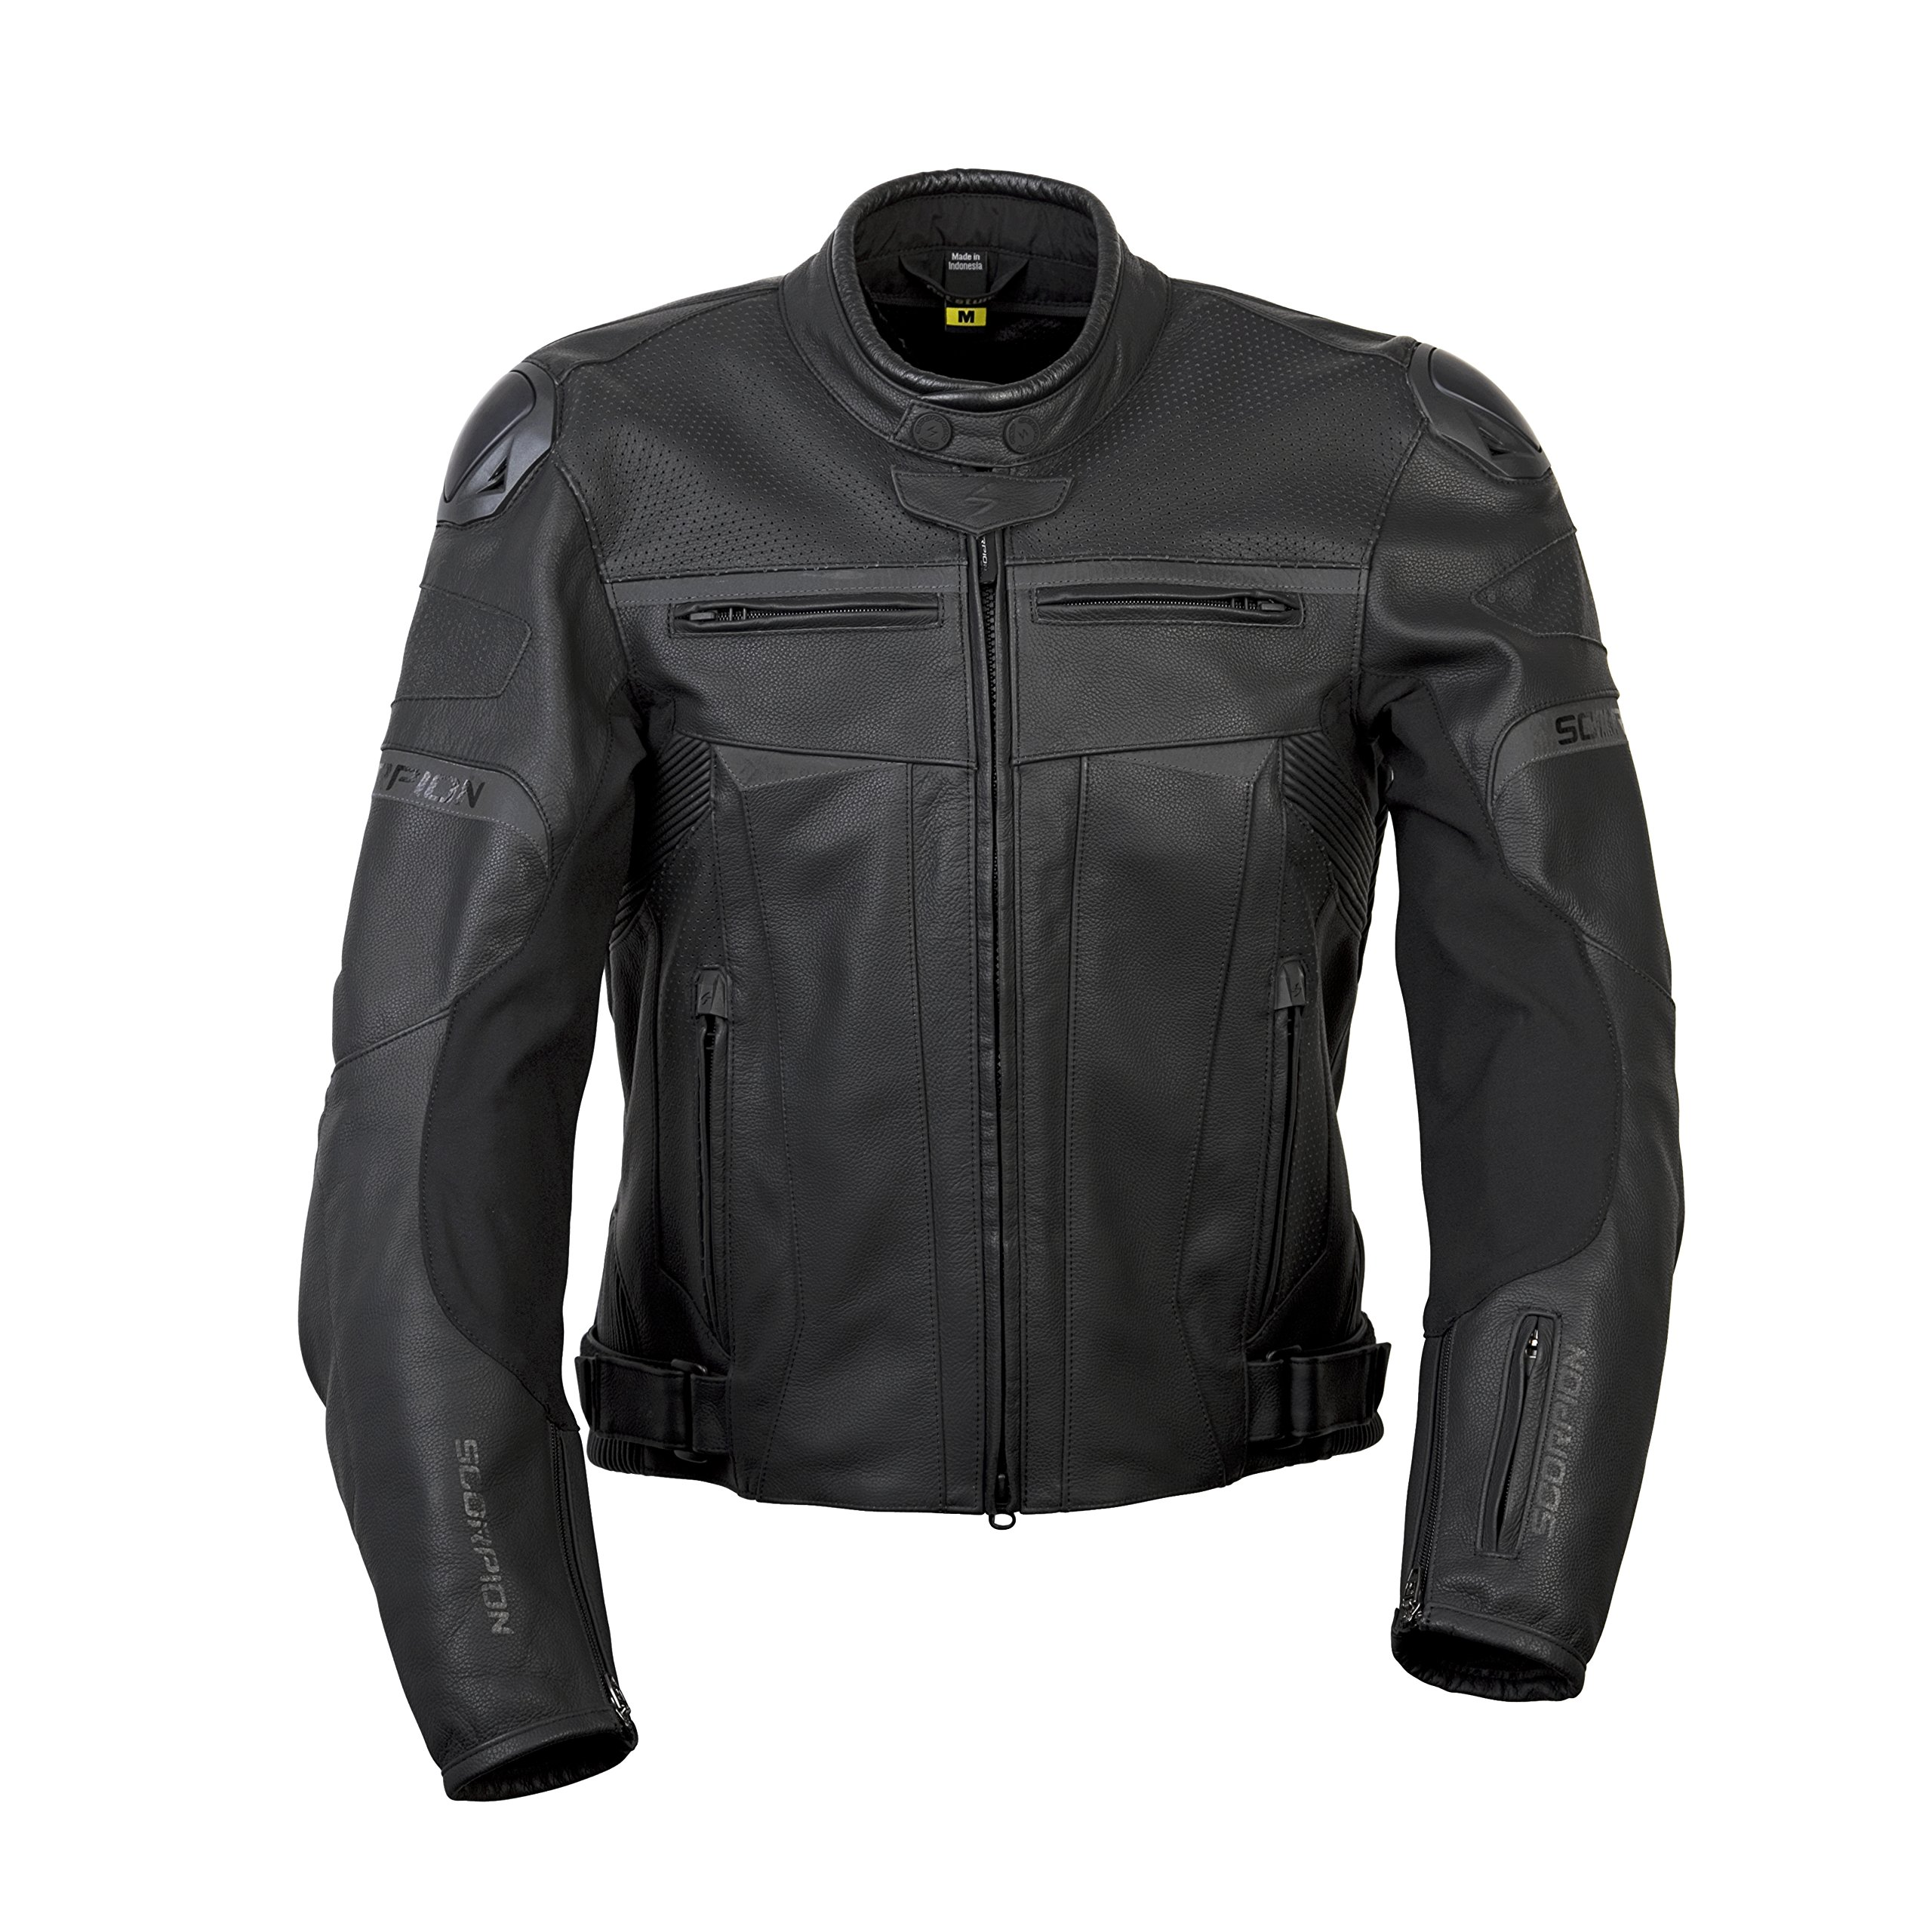 ScorpionExo Ravin Men's Leather Sport Motorcycle Jacket (Black, X-Large)